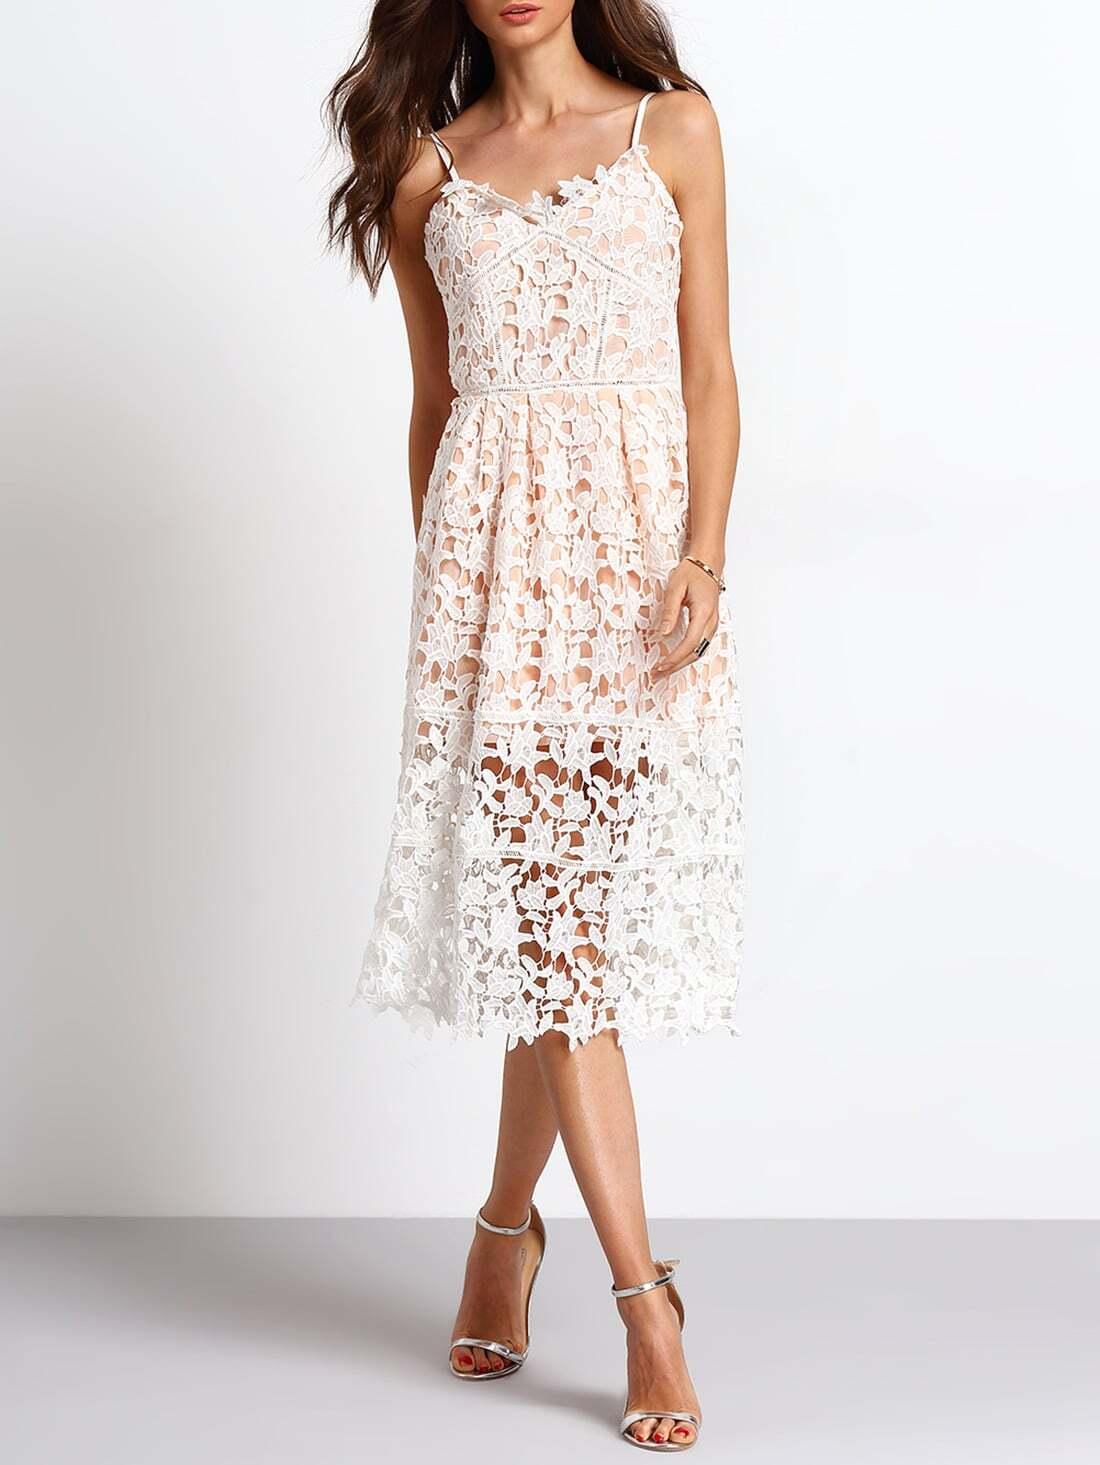 Slipdresses Haute Spaghetti Strap Back Zipper Hollow Braces Dress